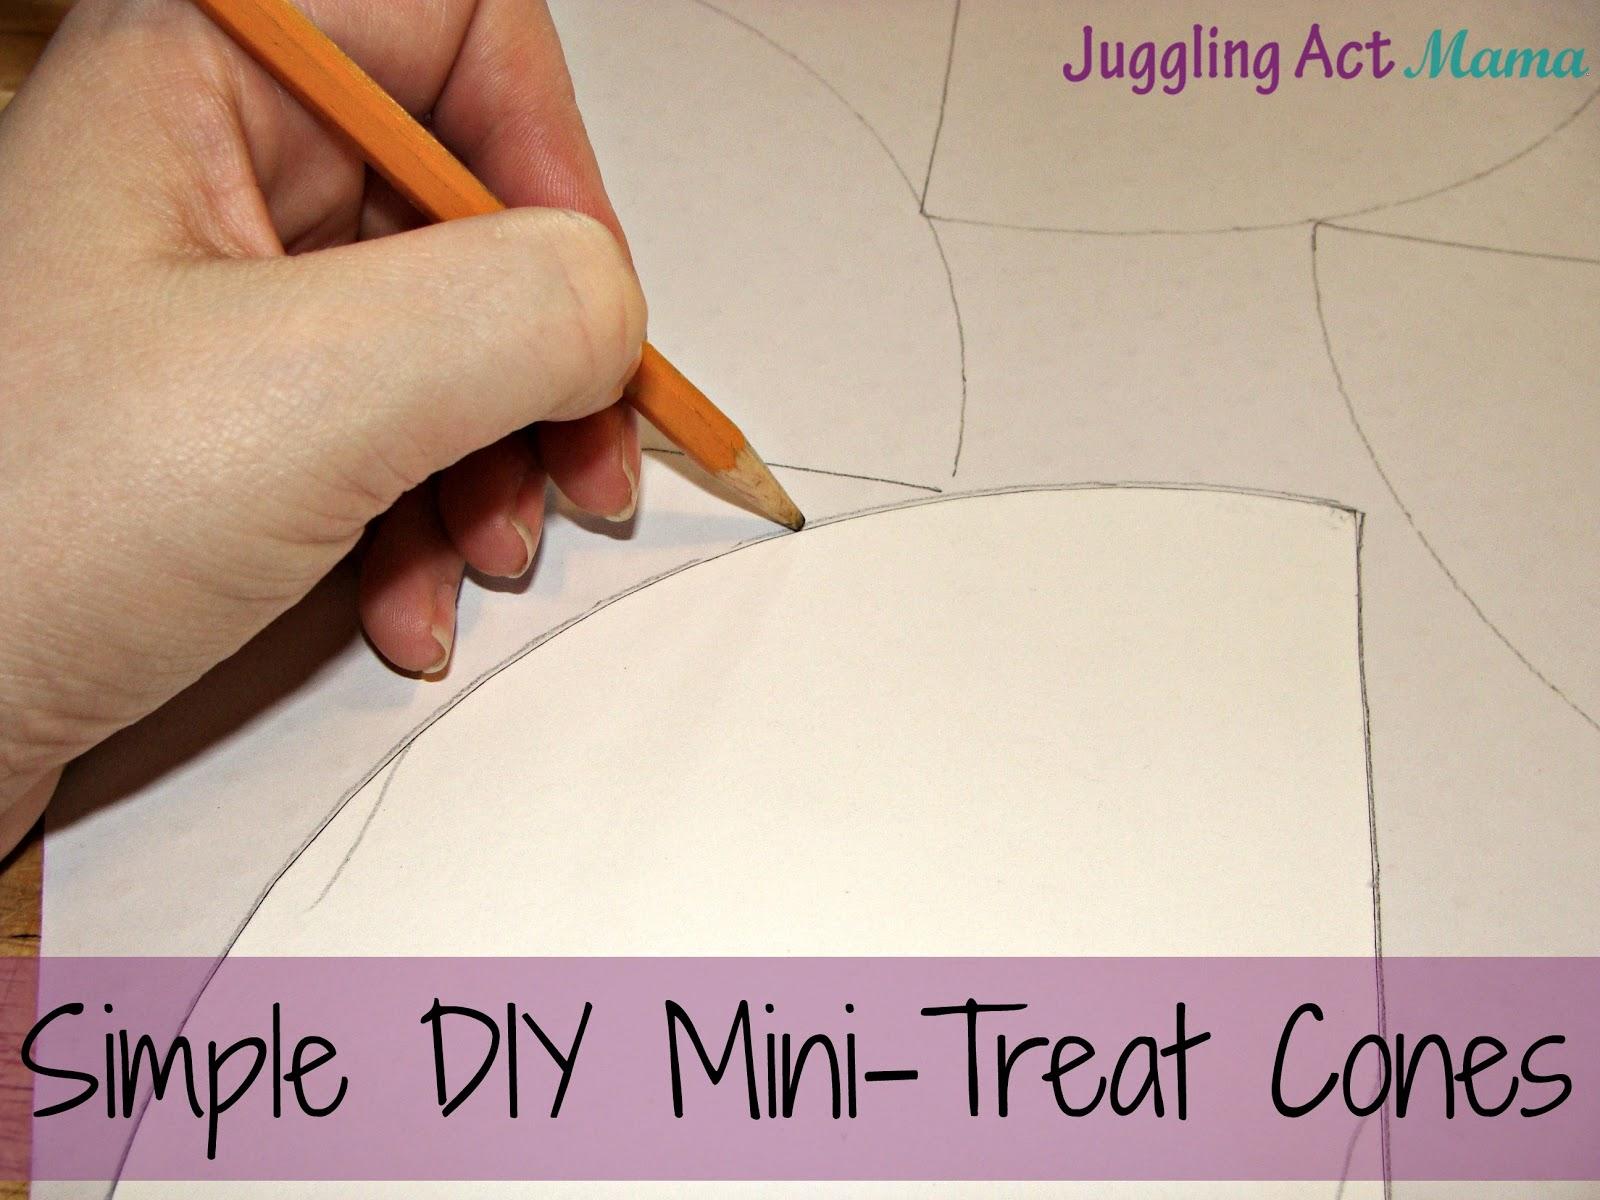 Simple Diy Mini Treat Cones Juggling Act Mama